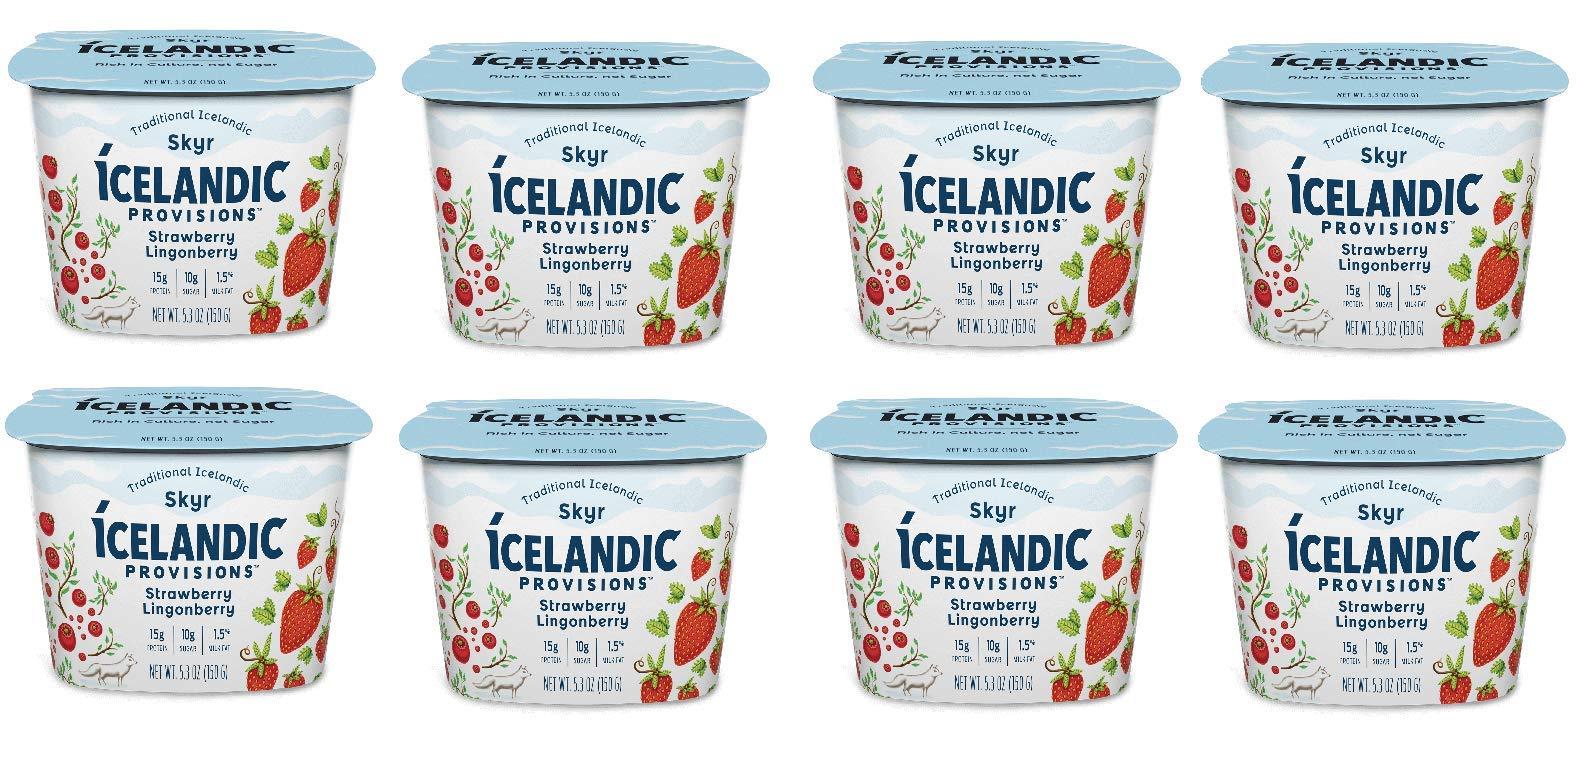 Icelandic Provisions, Skyr Strawberry Yogurt (Pack of 8)